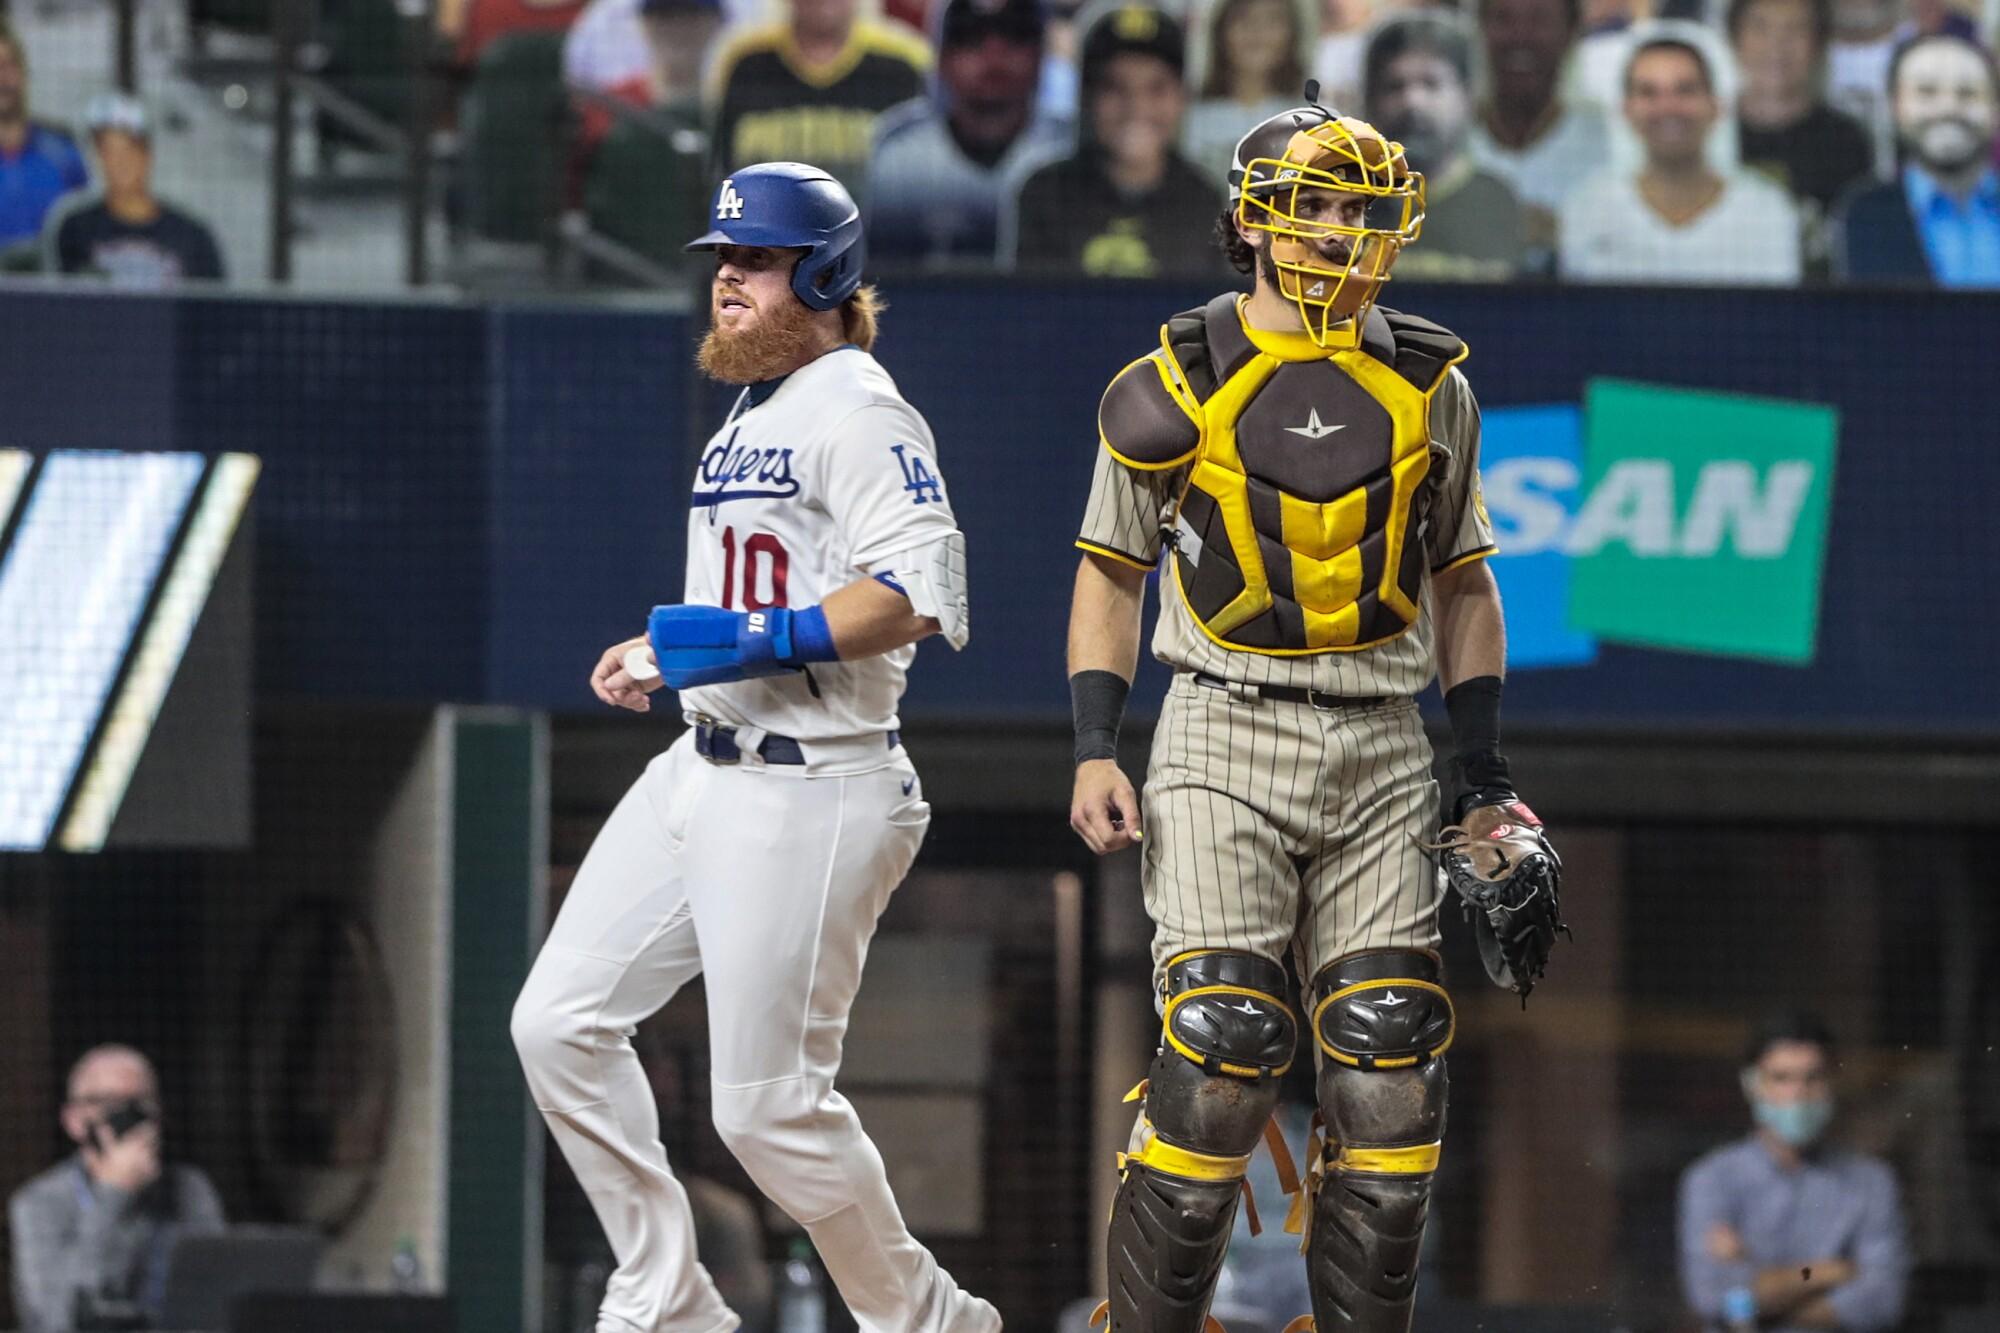 Arlington, Texas, Tuesday, October 6, 2020. Los Angeles Dodgers third baseman Justin Turner (10) scores.